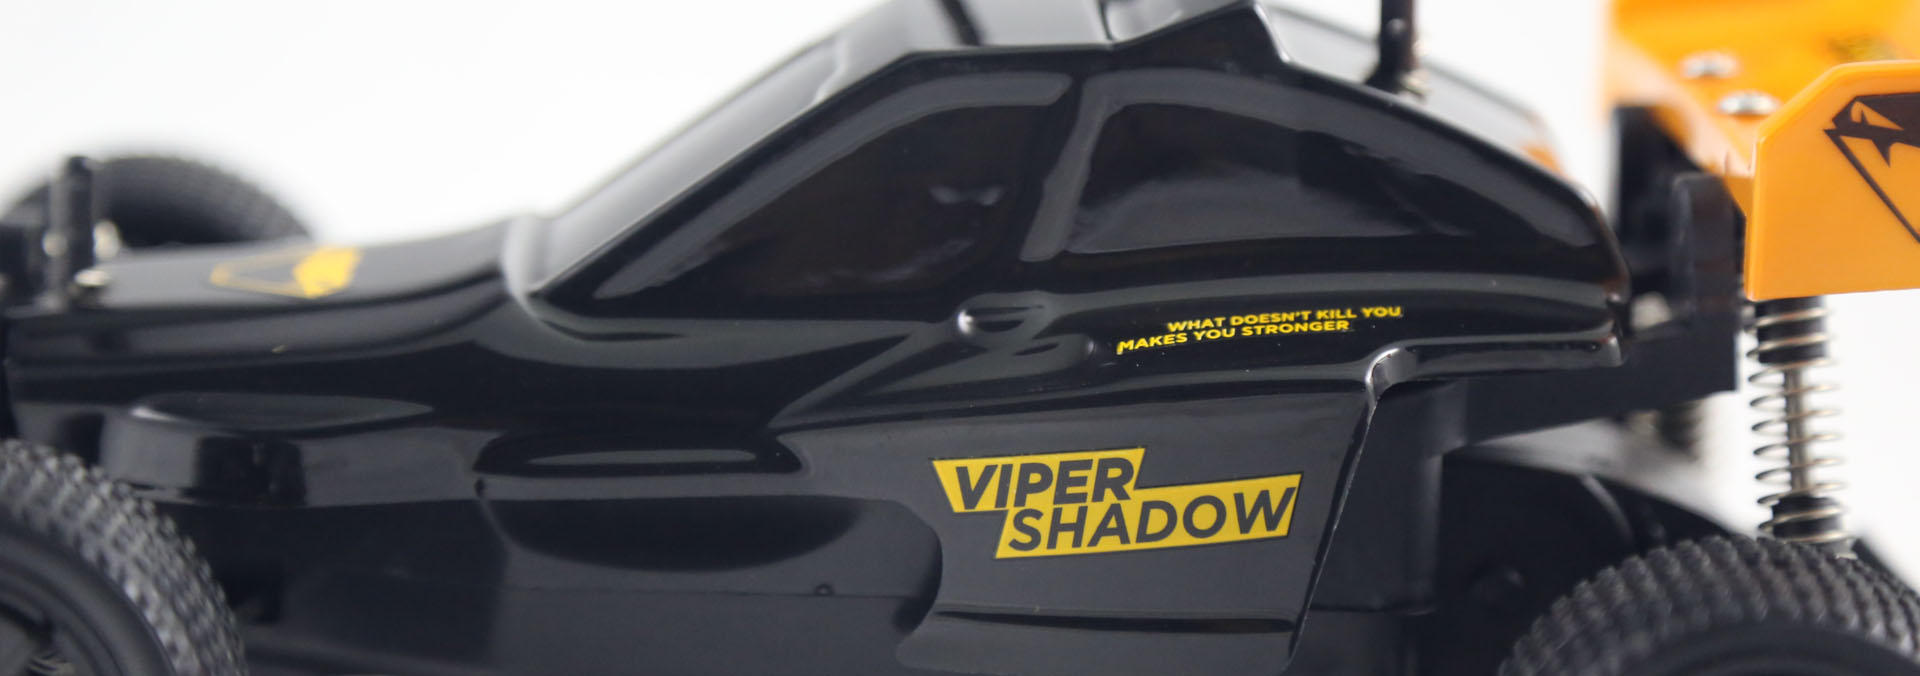 Viper Shadow-04.jpg